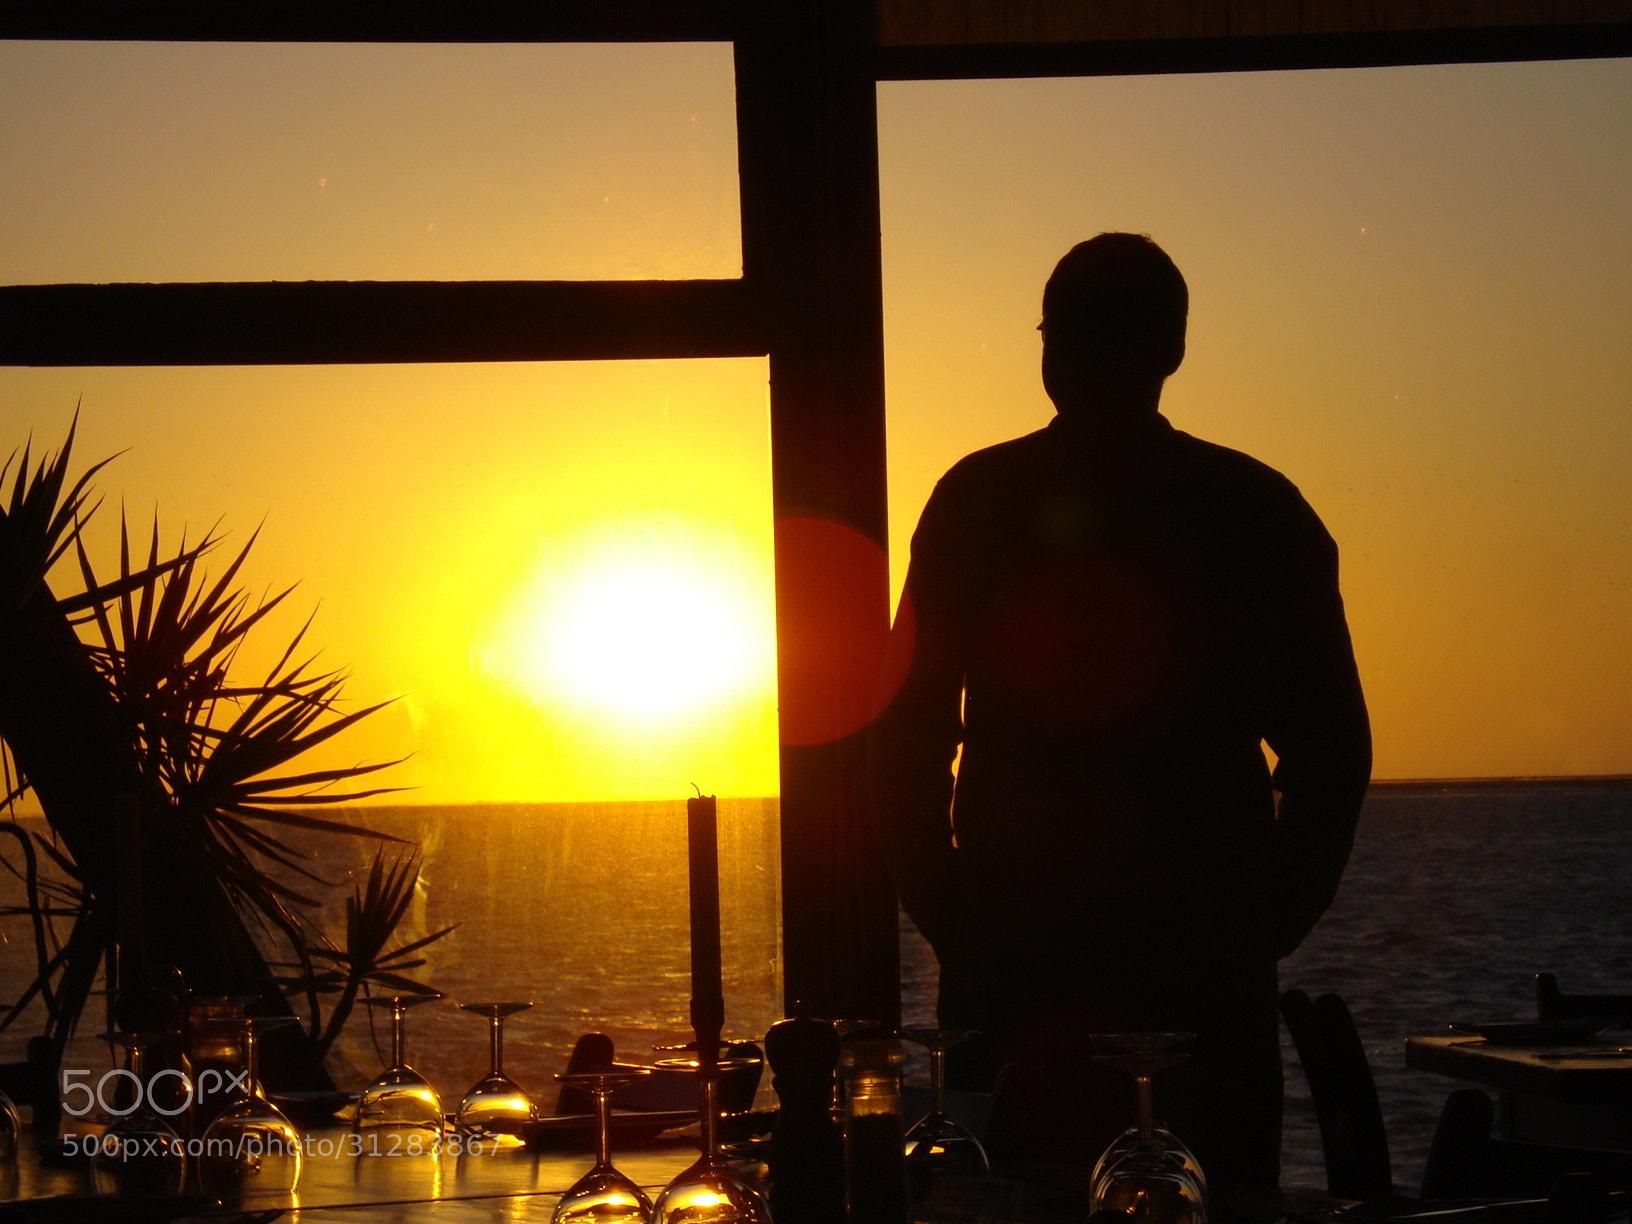 Photograph Walvis Bay by sun set on 500px